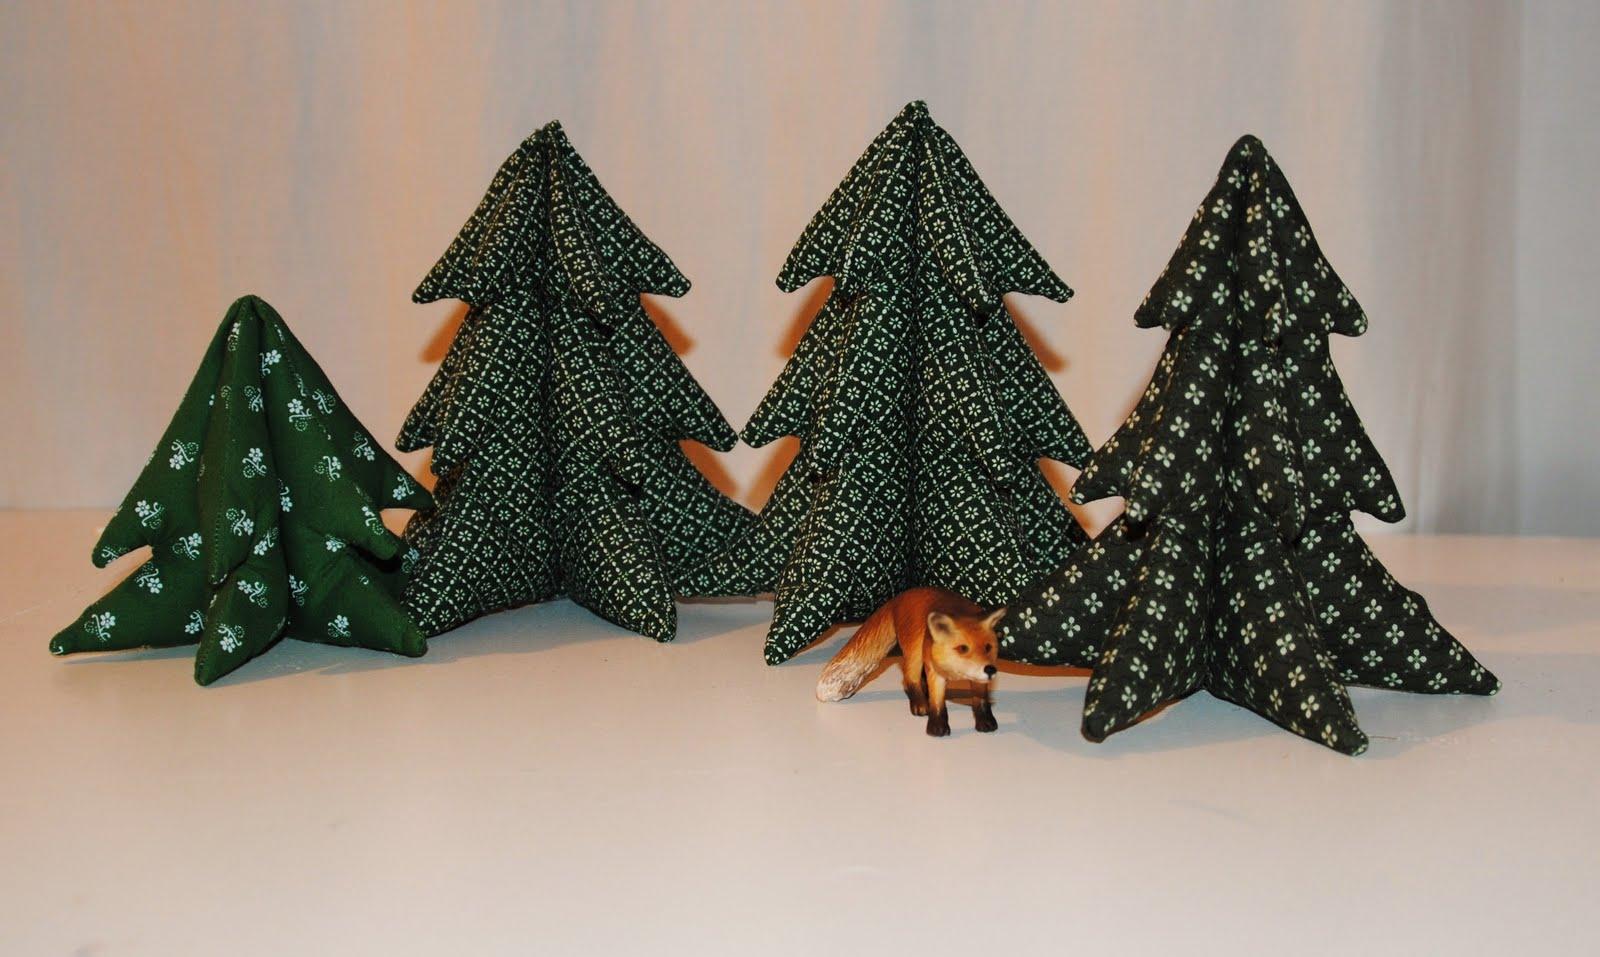 pin vorlage tannenbaum on pinterest. Black Bedroom Furniture Sets. Home Design Ideas